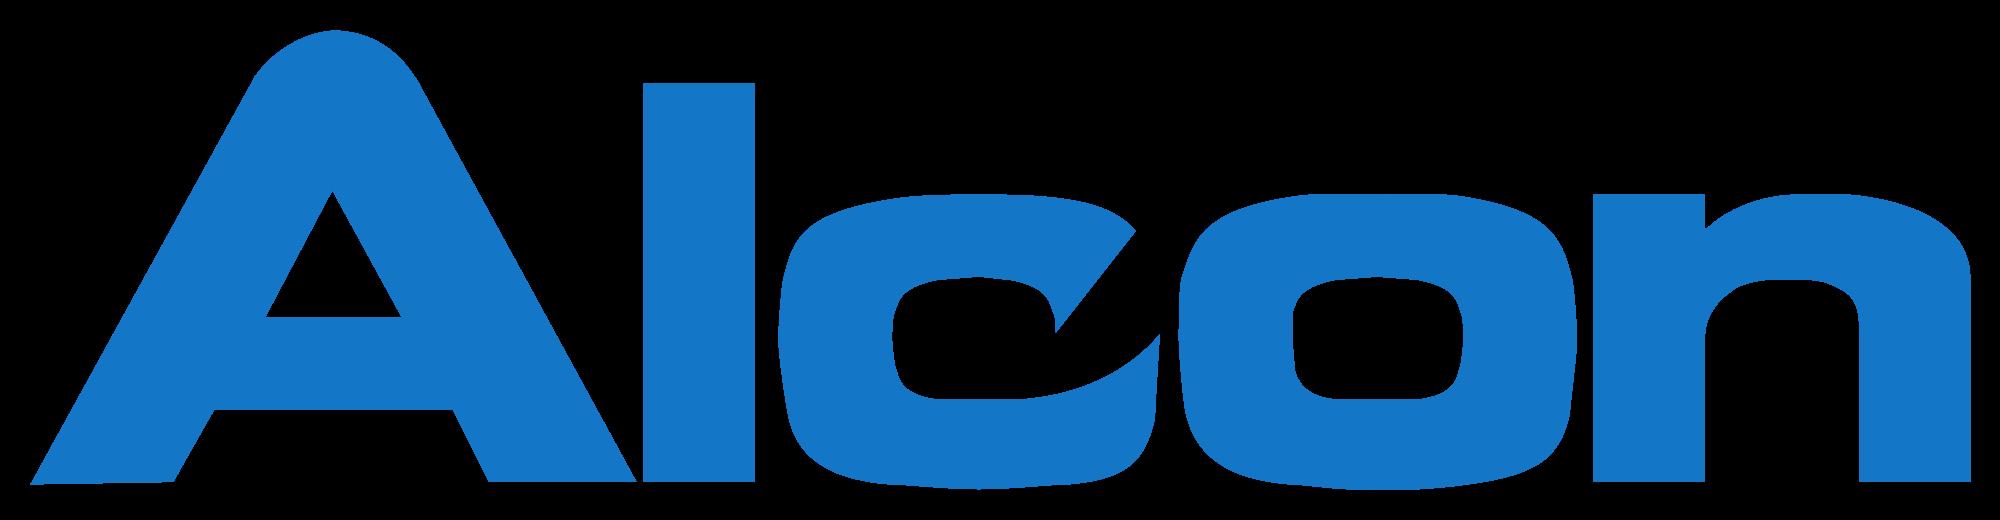 2000px-Logo_Alcon.svg